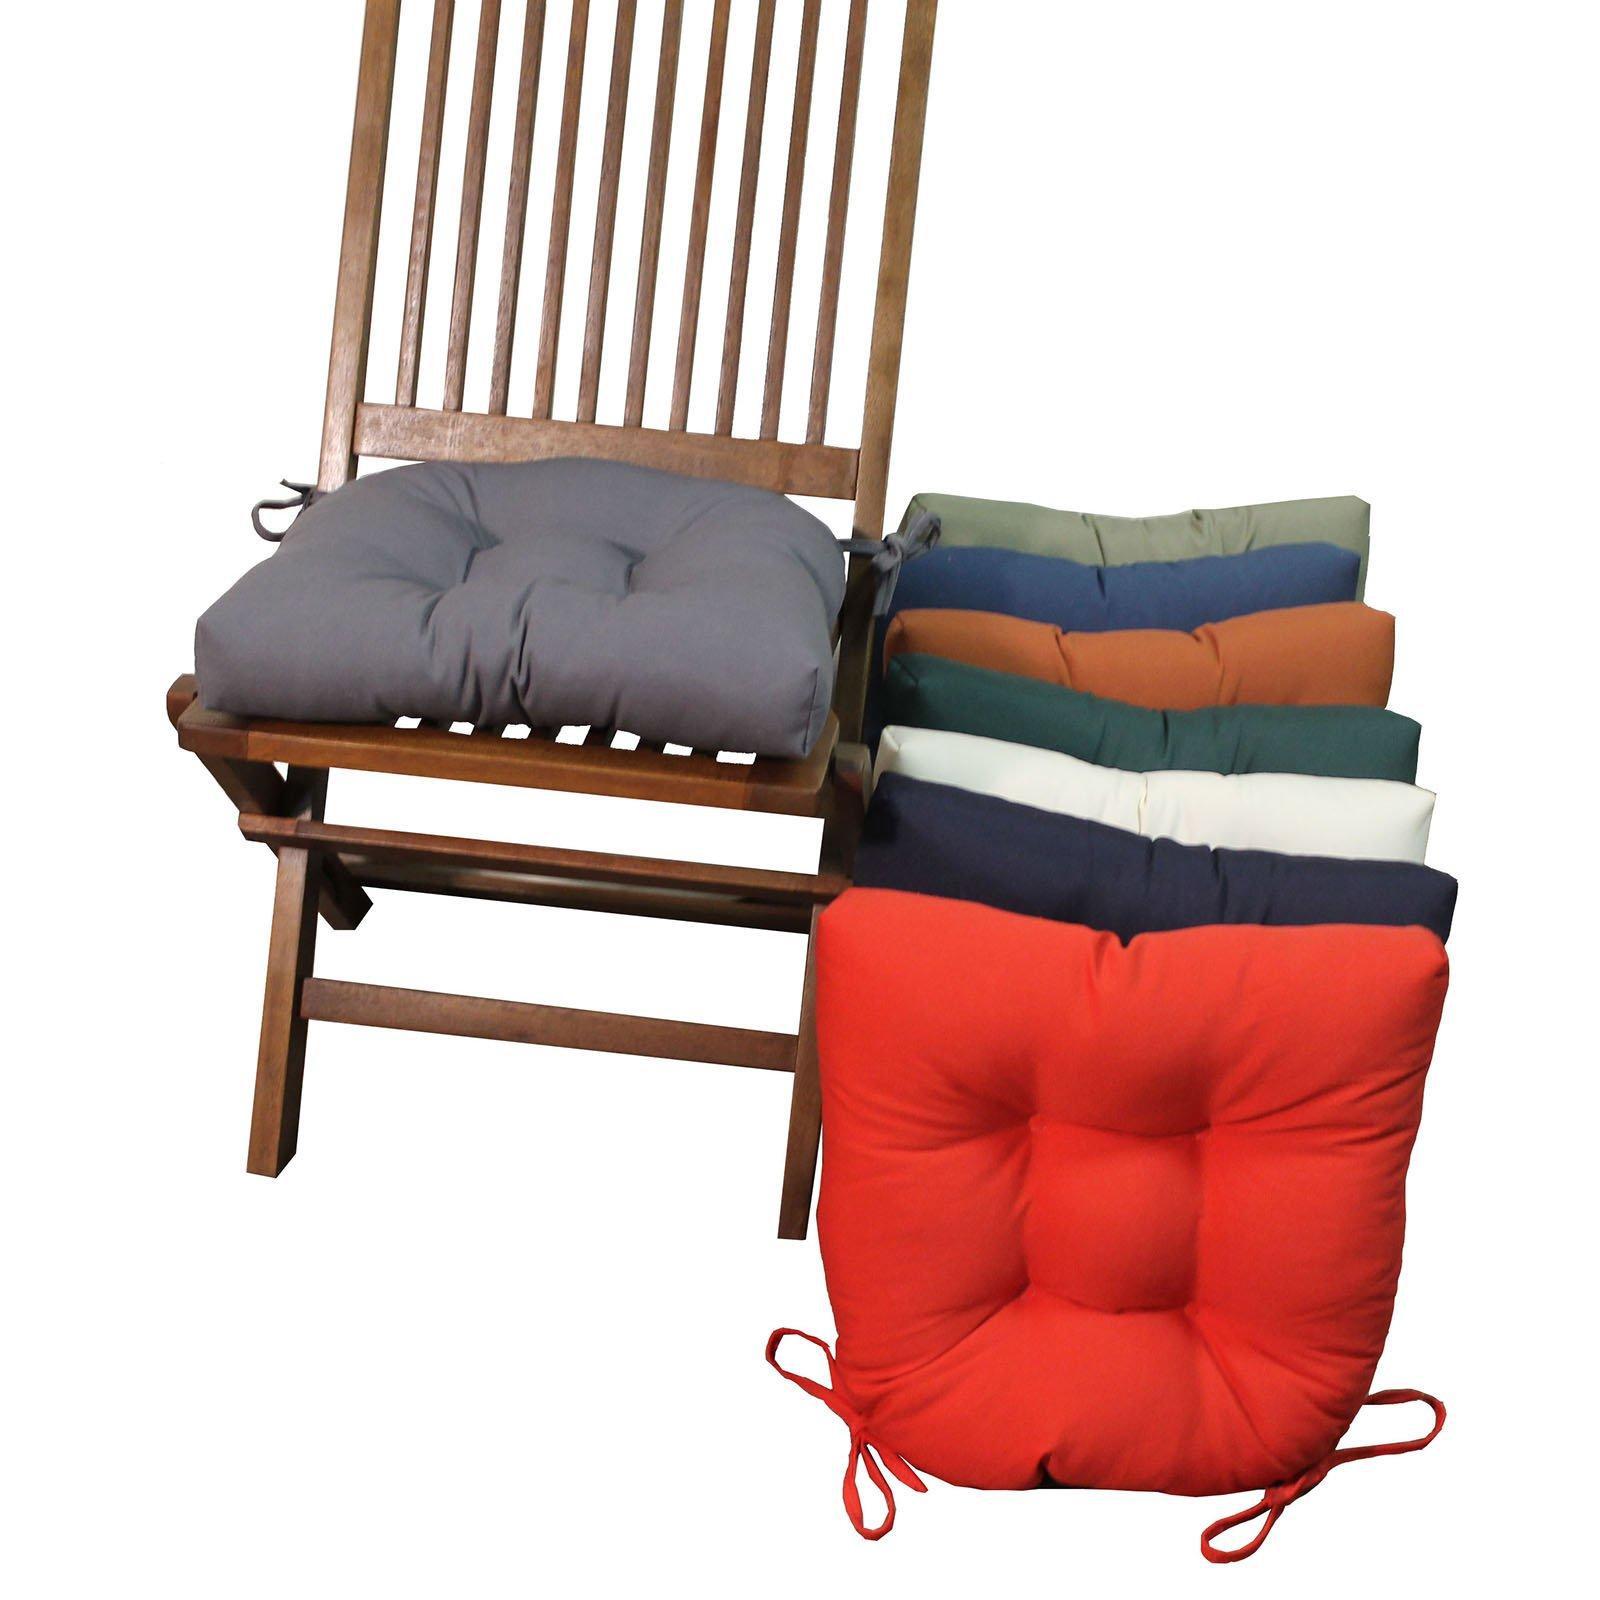 Twill dining room chair cushions - set of 4 |  Hayneedle PJWURTX